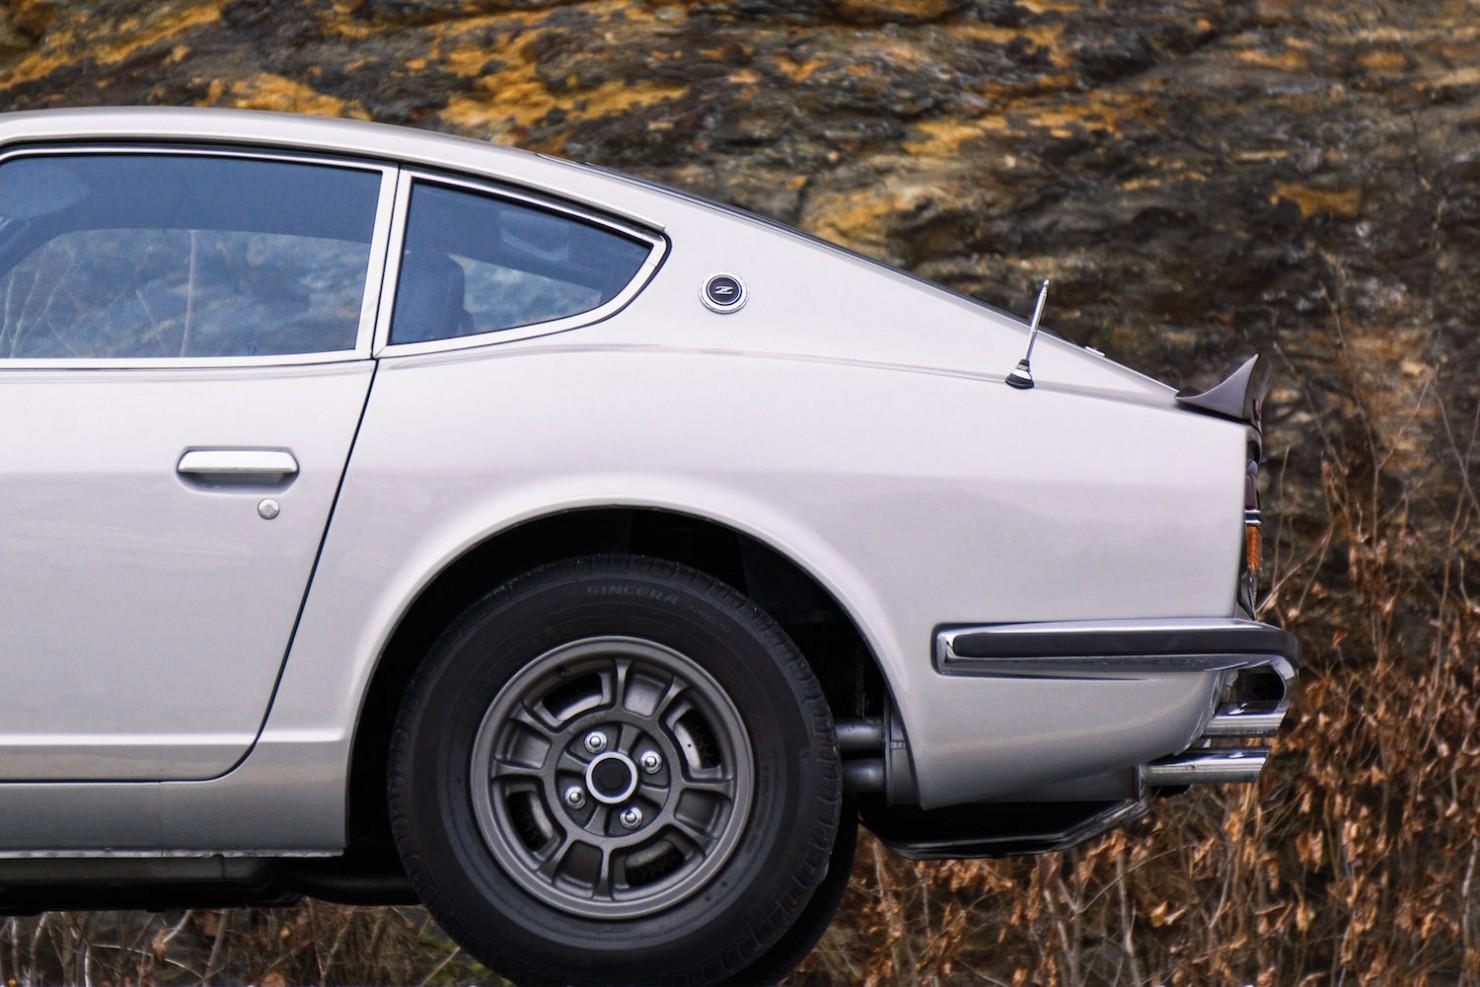 Nissan-Fairlady-Z-432-9